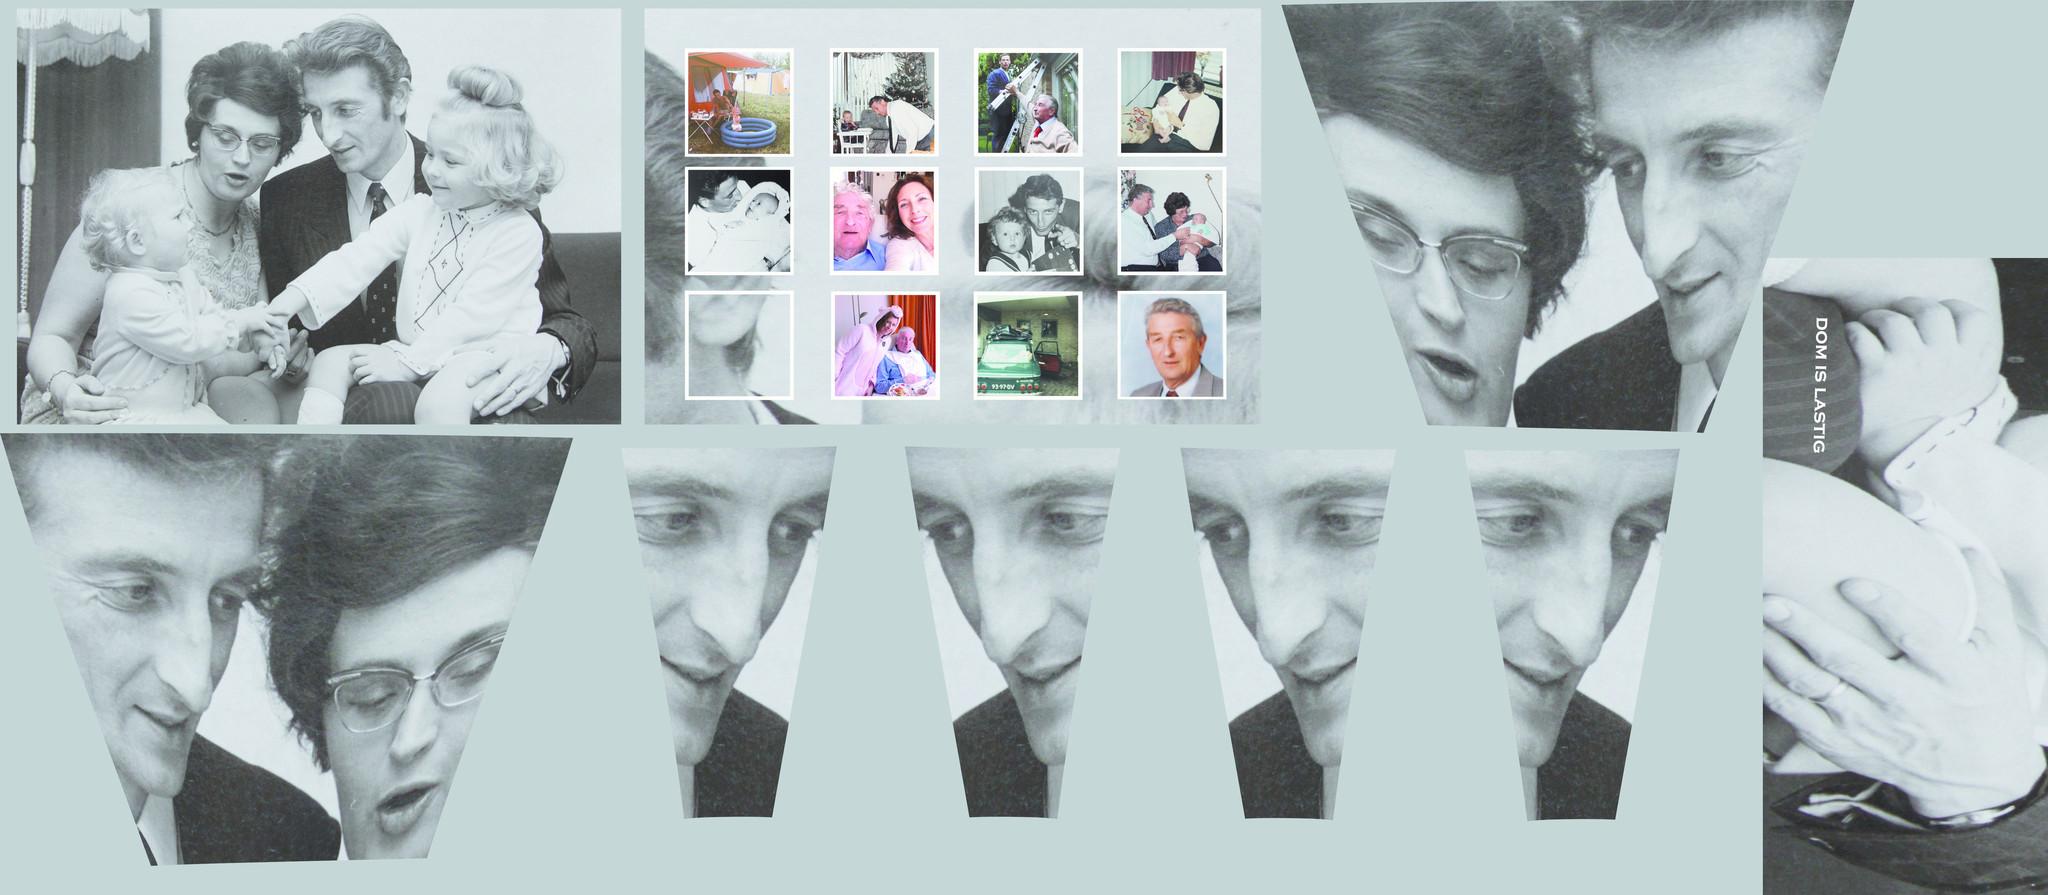 Fotos in jouw Memory lane tas